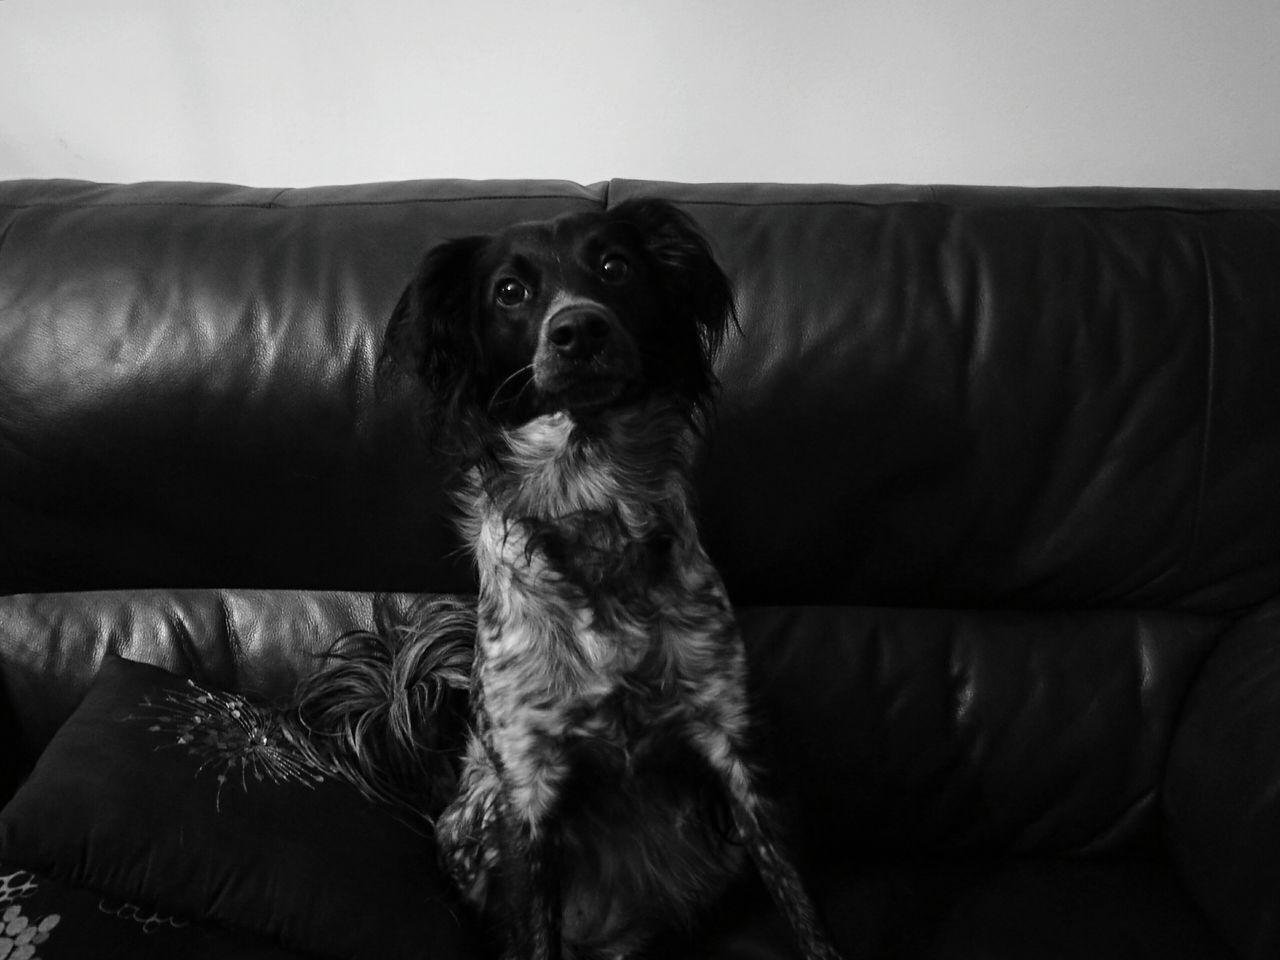 Monochrome Photography Ginevra Dog Pets Domestic Animals Black And White Bianco E Nero Animal